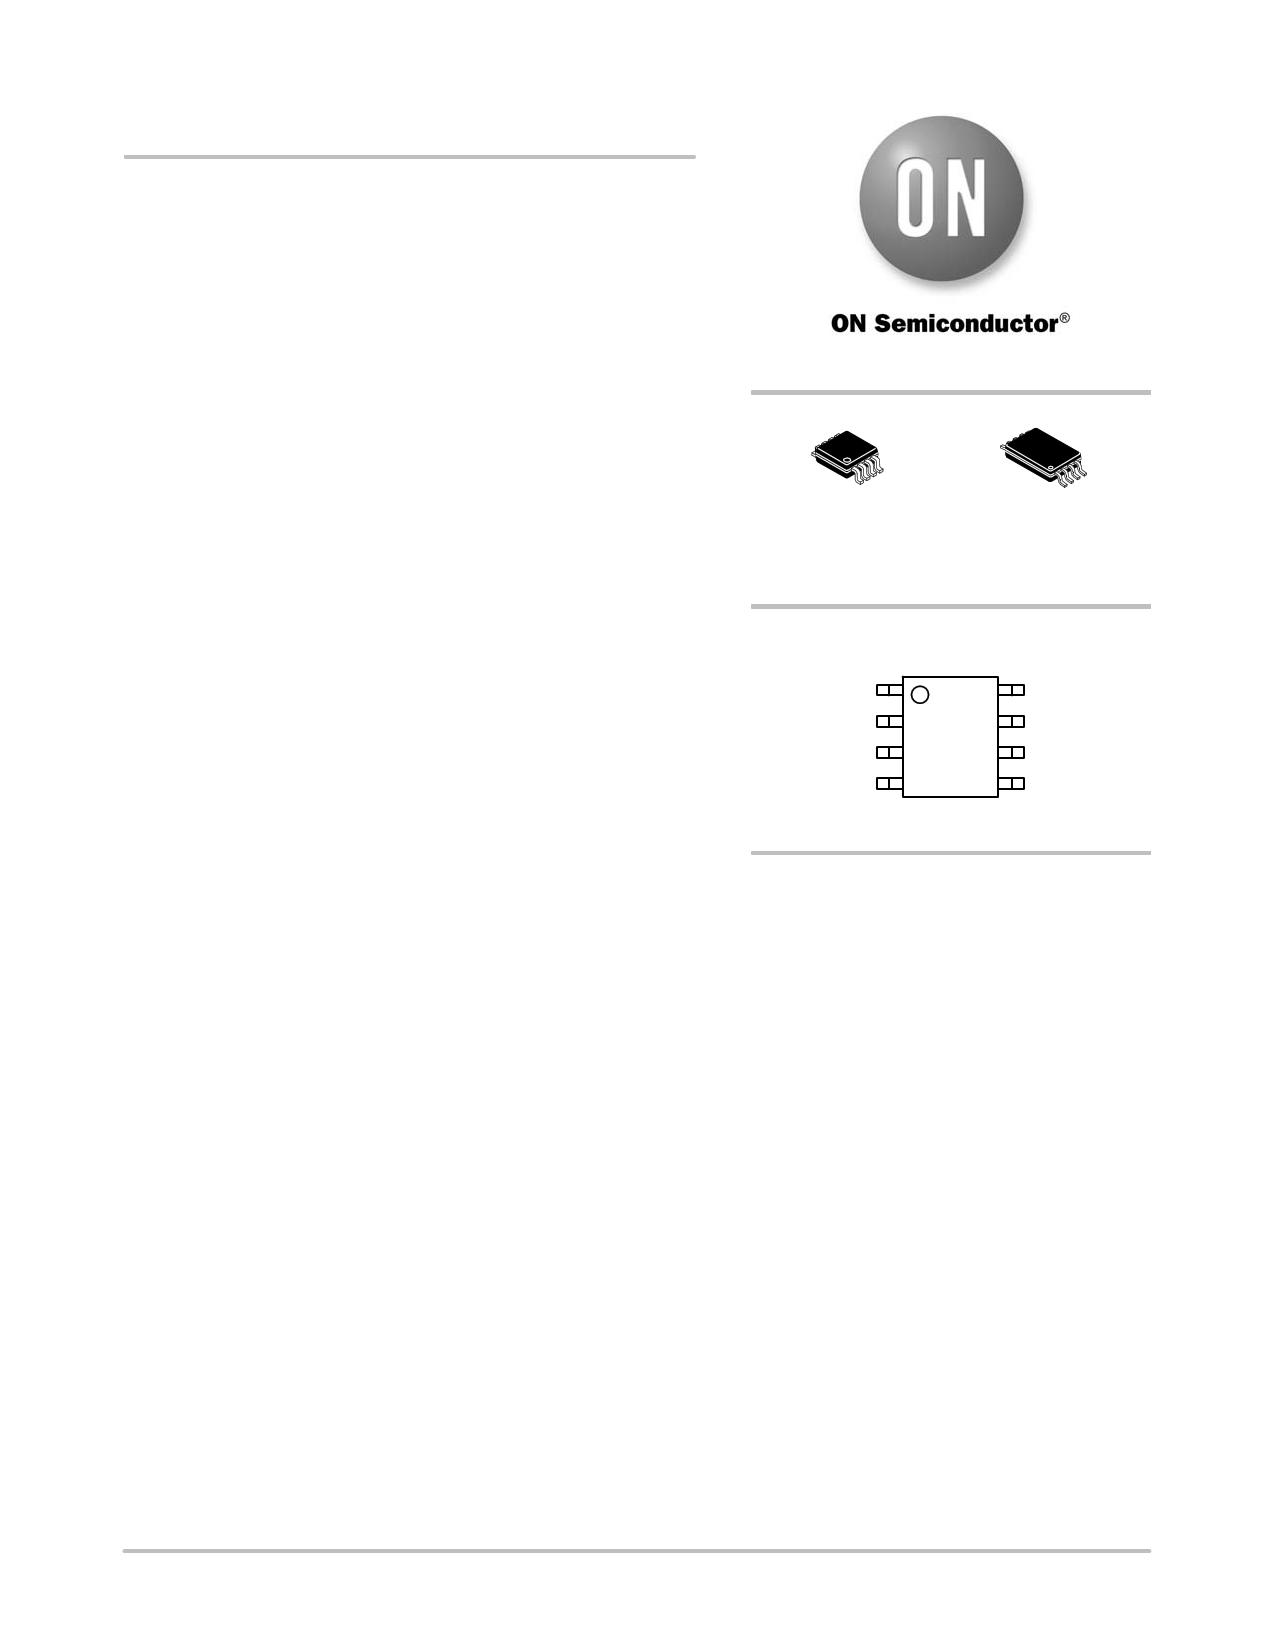 ASM3P2182A Datasheet, ASM3P2182A PDF,ピン配置, 機能